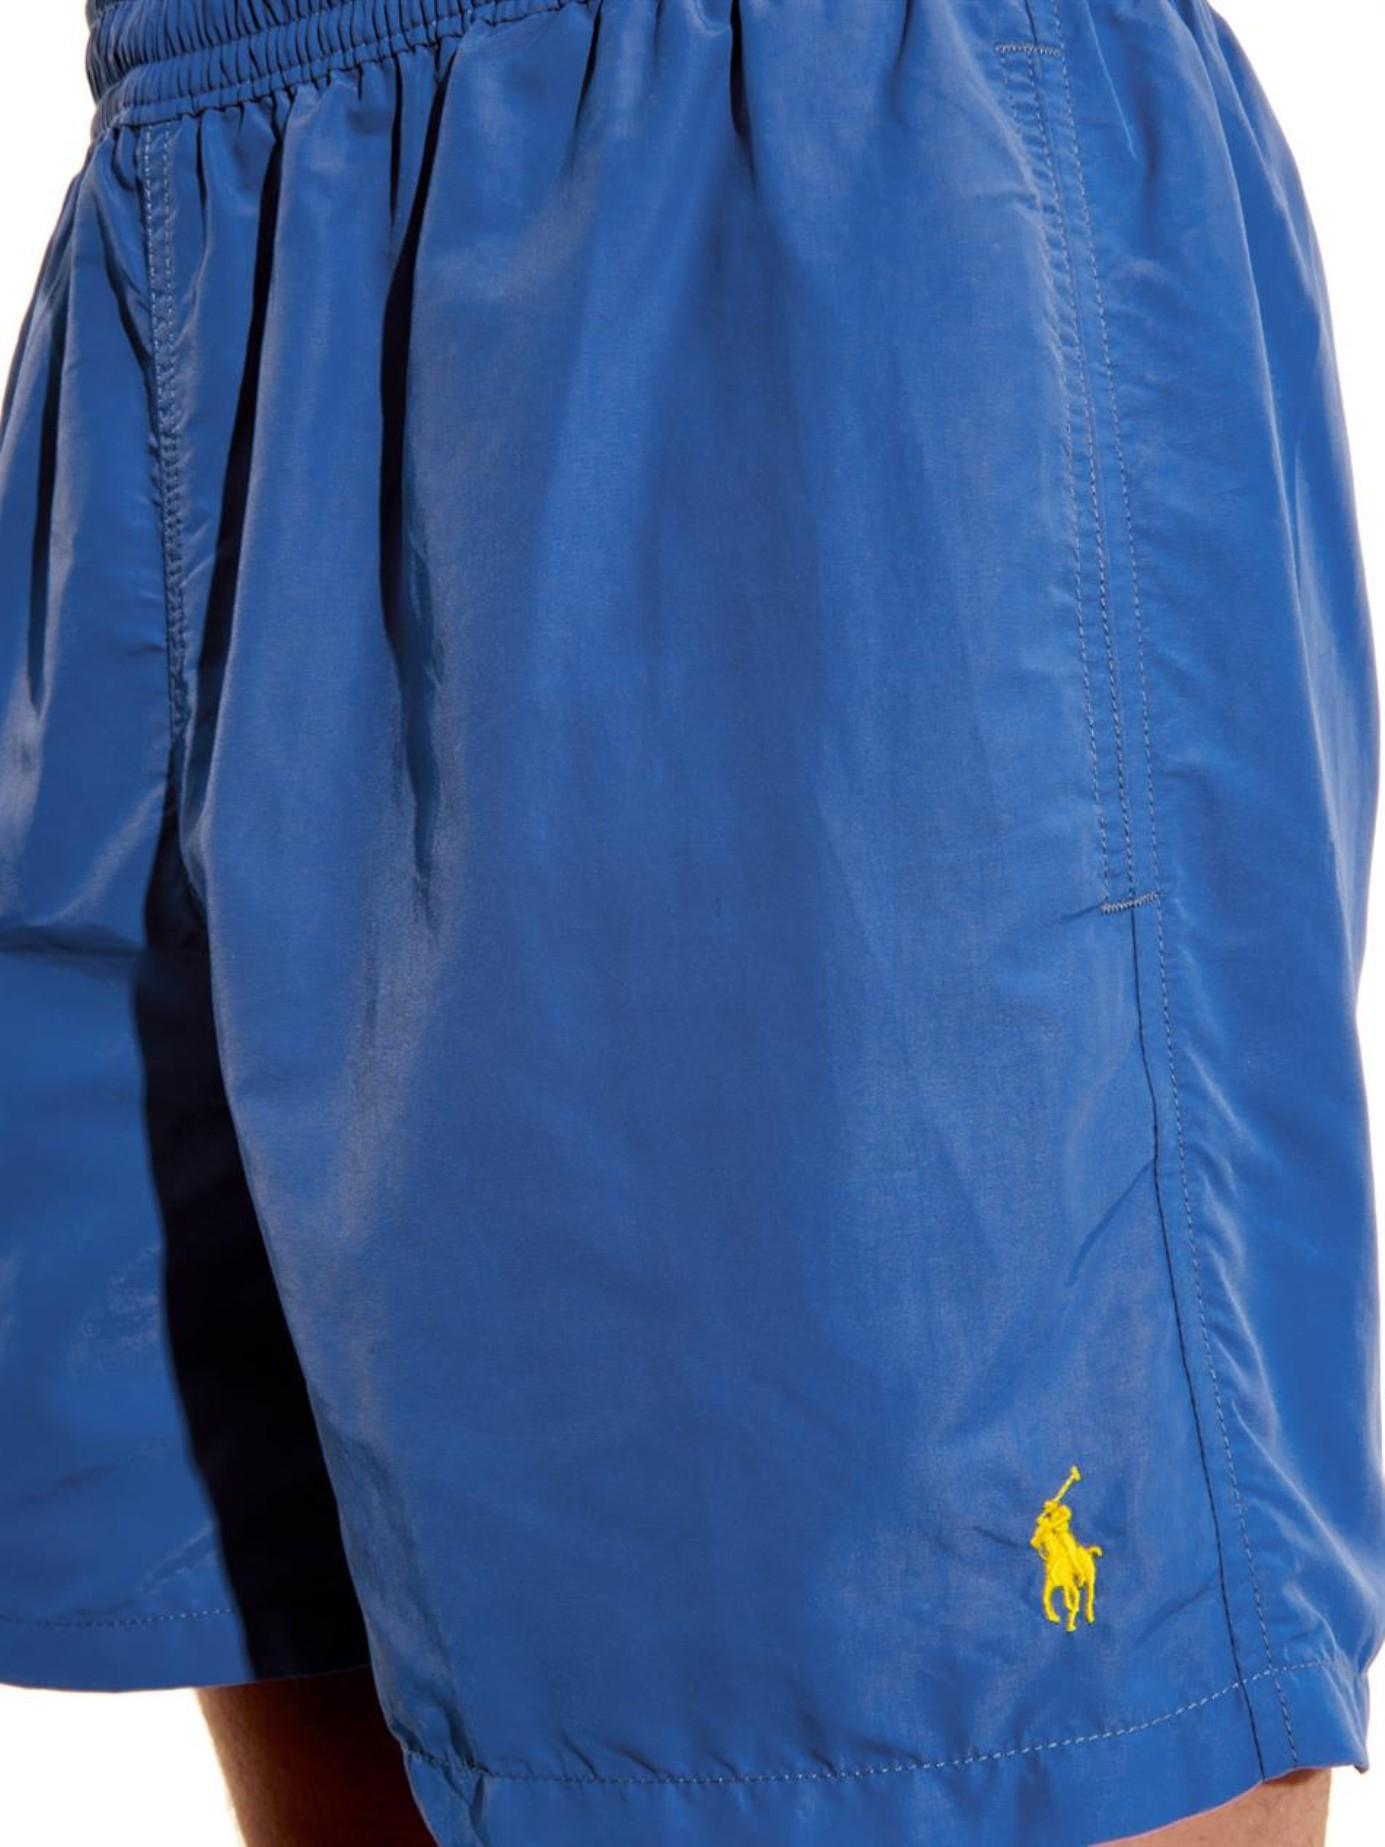 polo ralph lauren hawaiian 5 swim boxer in yellow for men. Black Bedroom Furniture Sets. Home Design Ideas